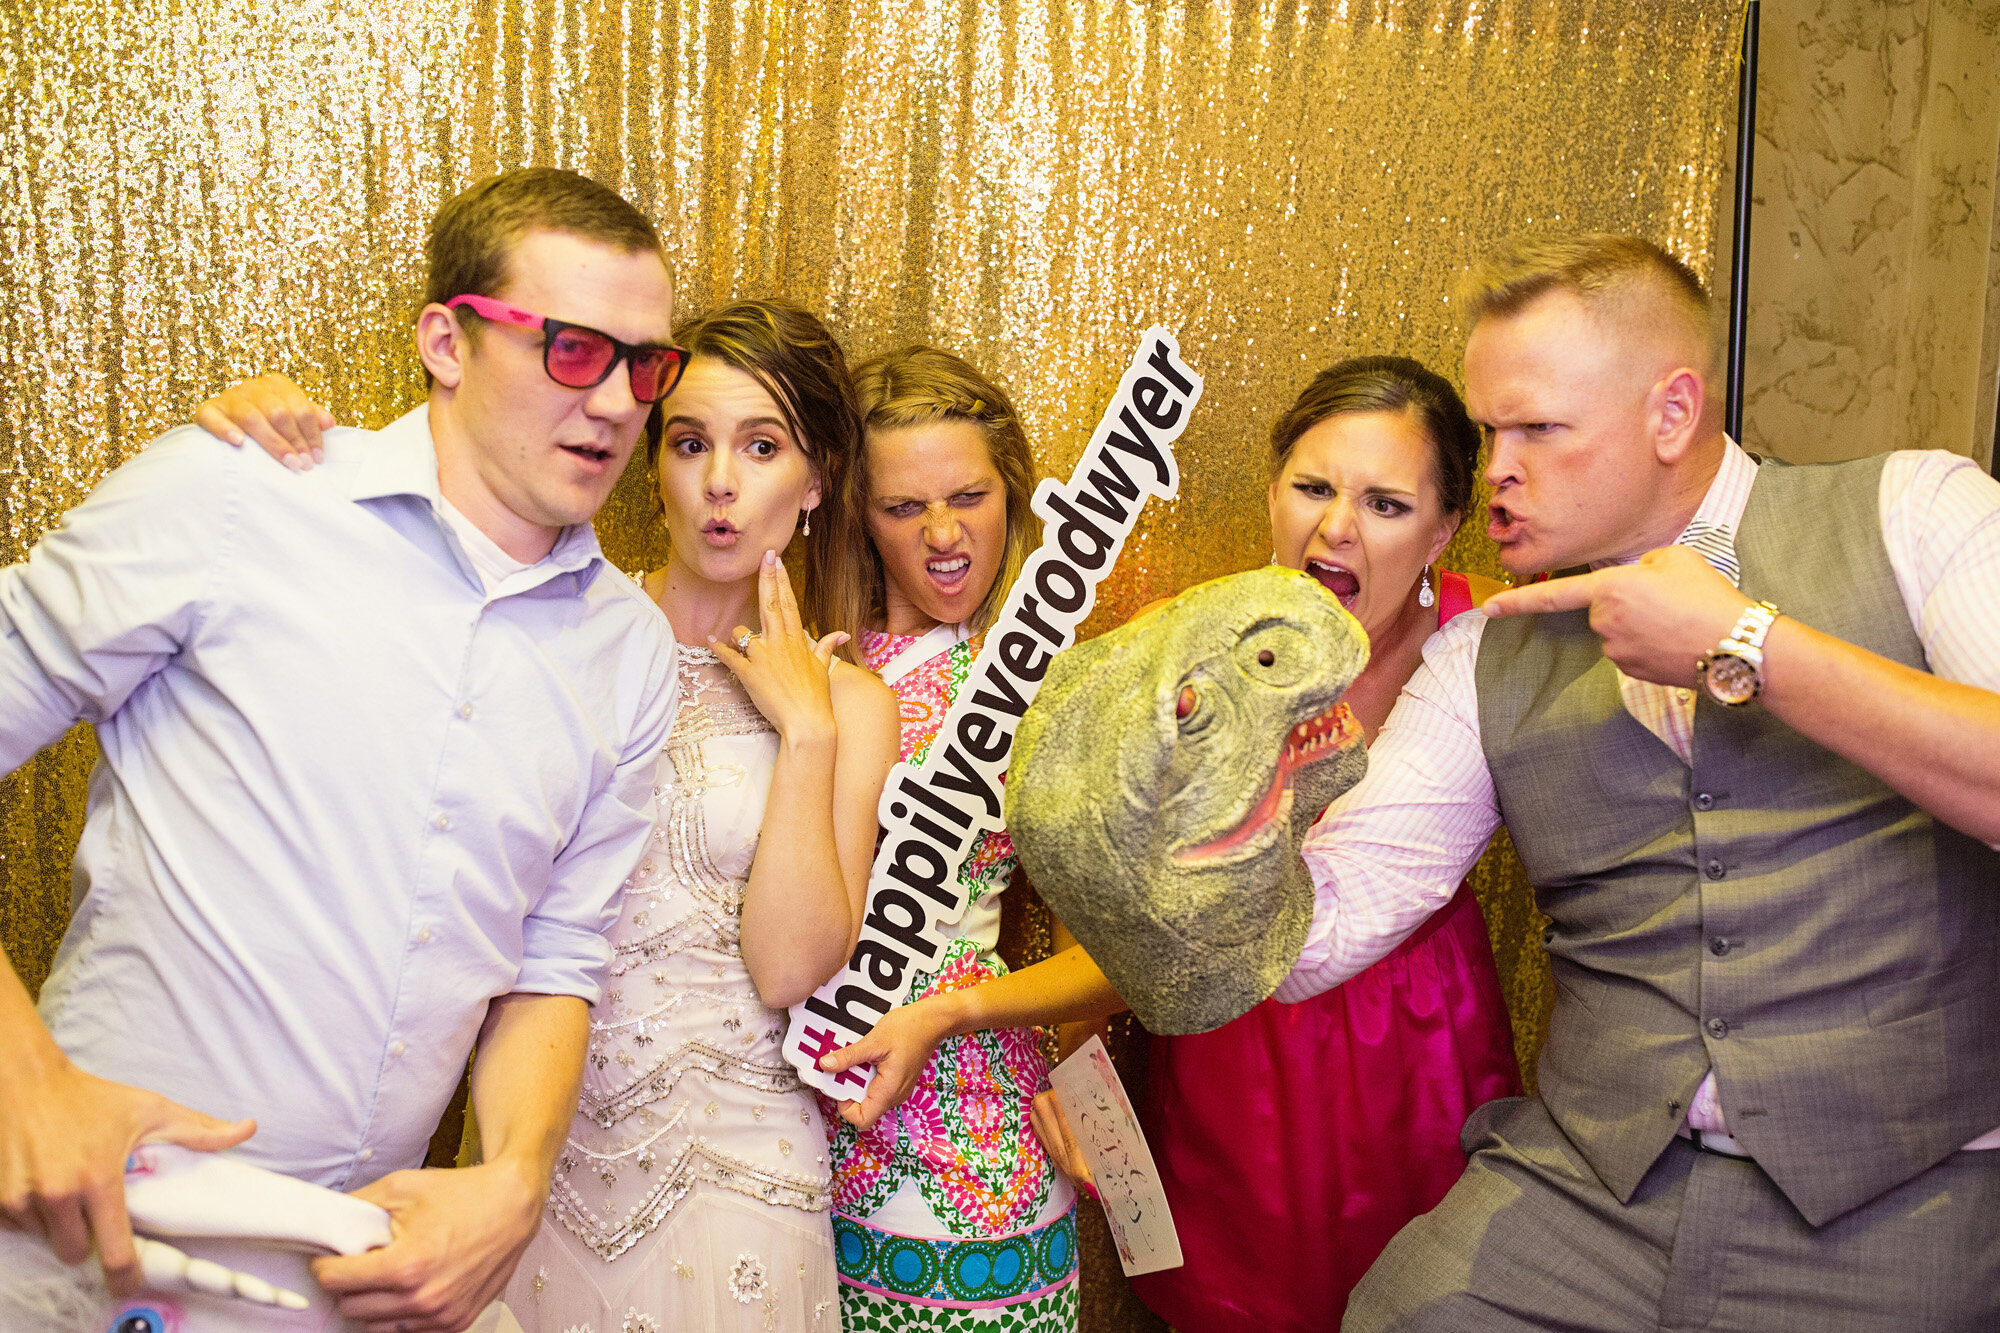 Seriously_Sabrina_Photography_Colorado_Springs_Club_at_Flying_Horse_Destination_Wedding_ODwyer134.jpg